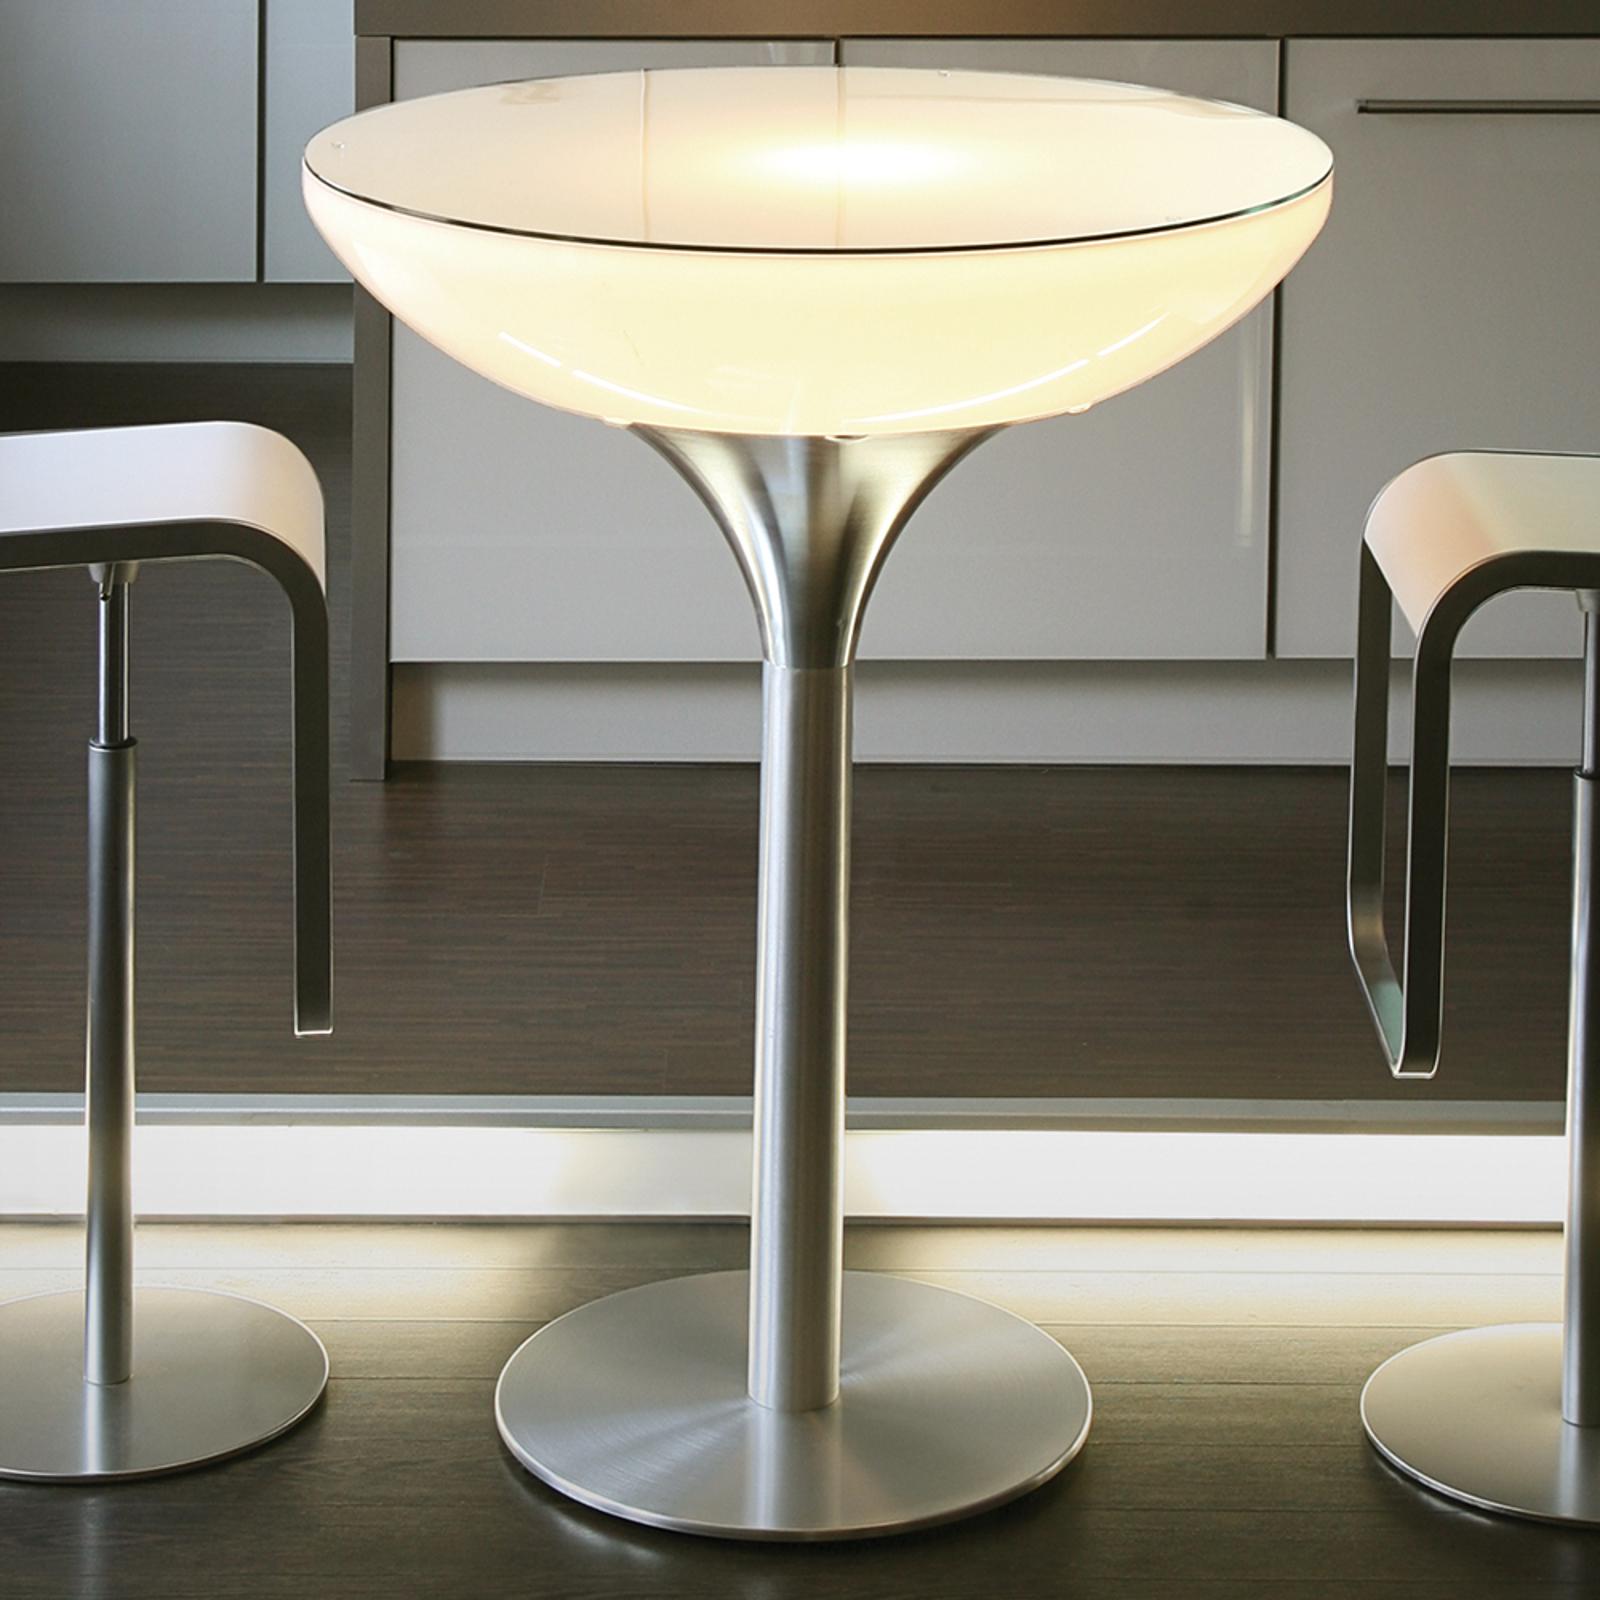 Leuchttisch Lounge Table LED Pro H 105 cm